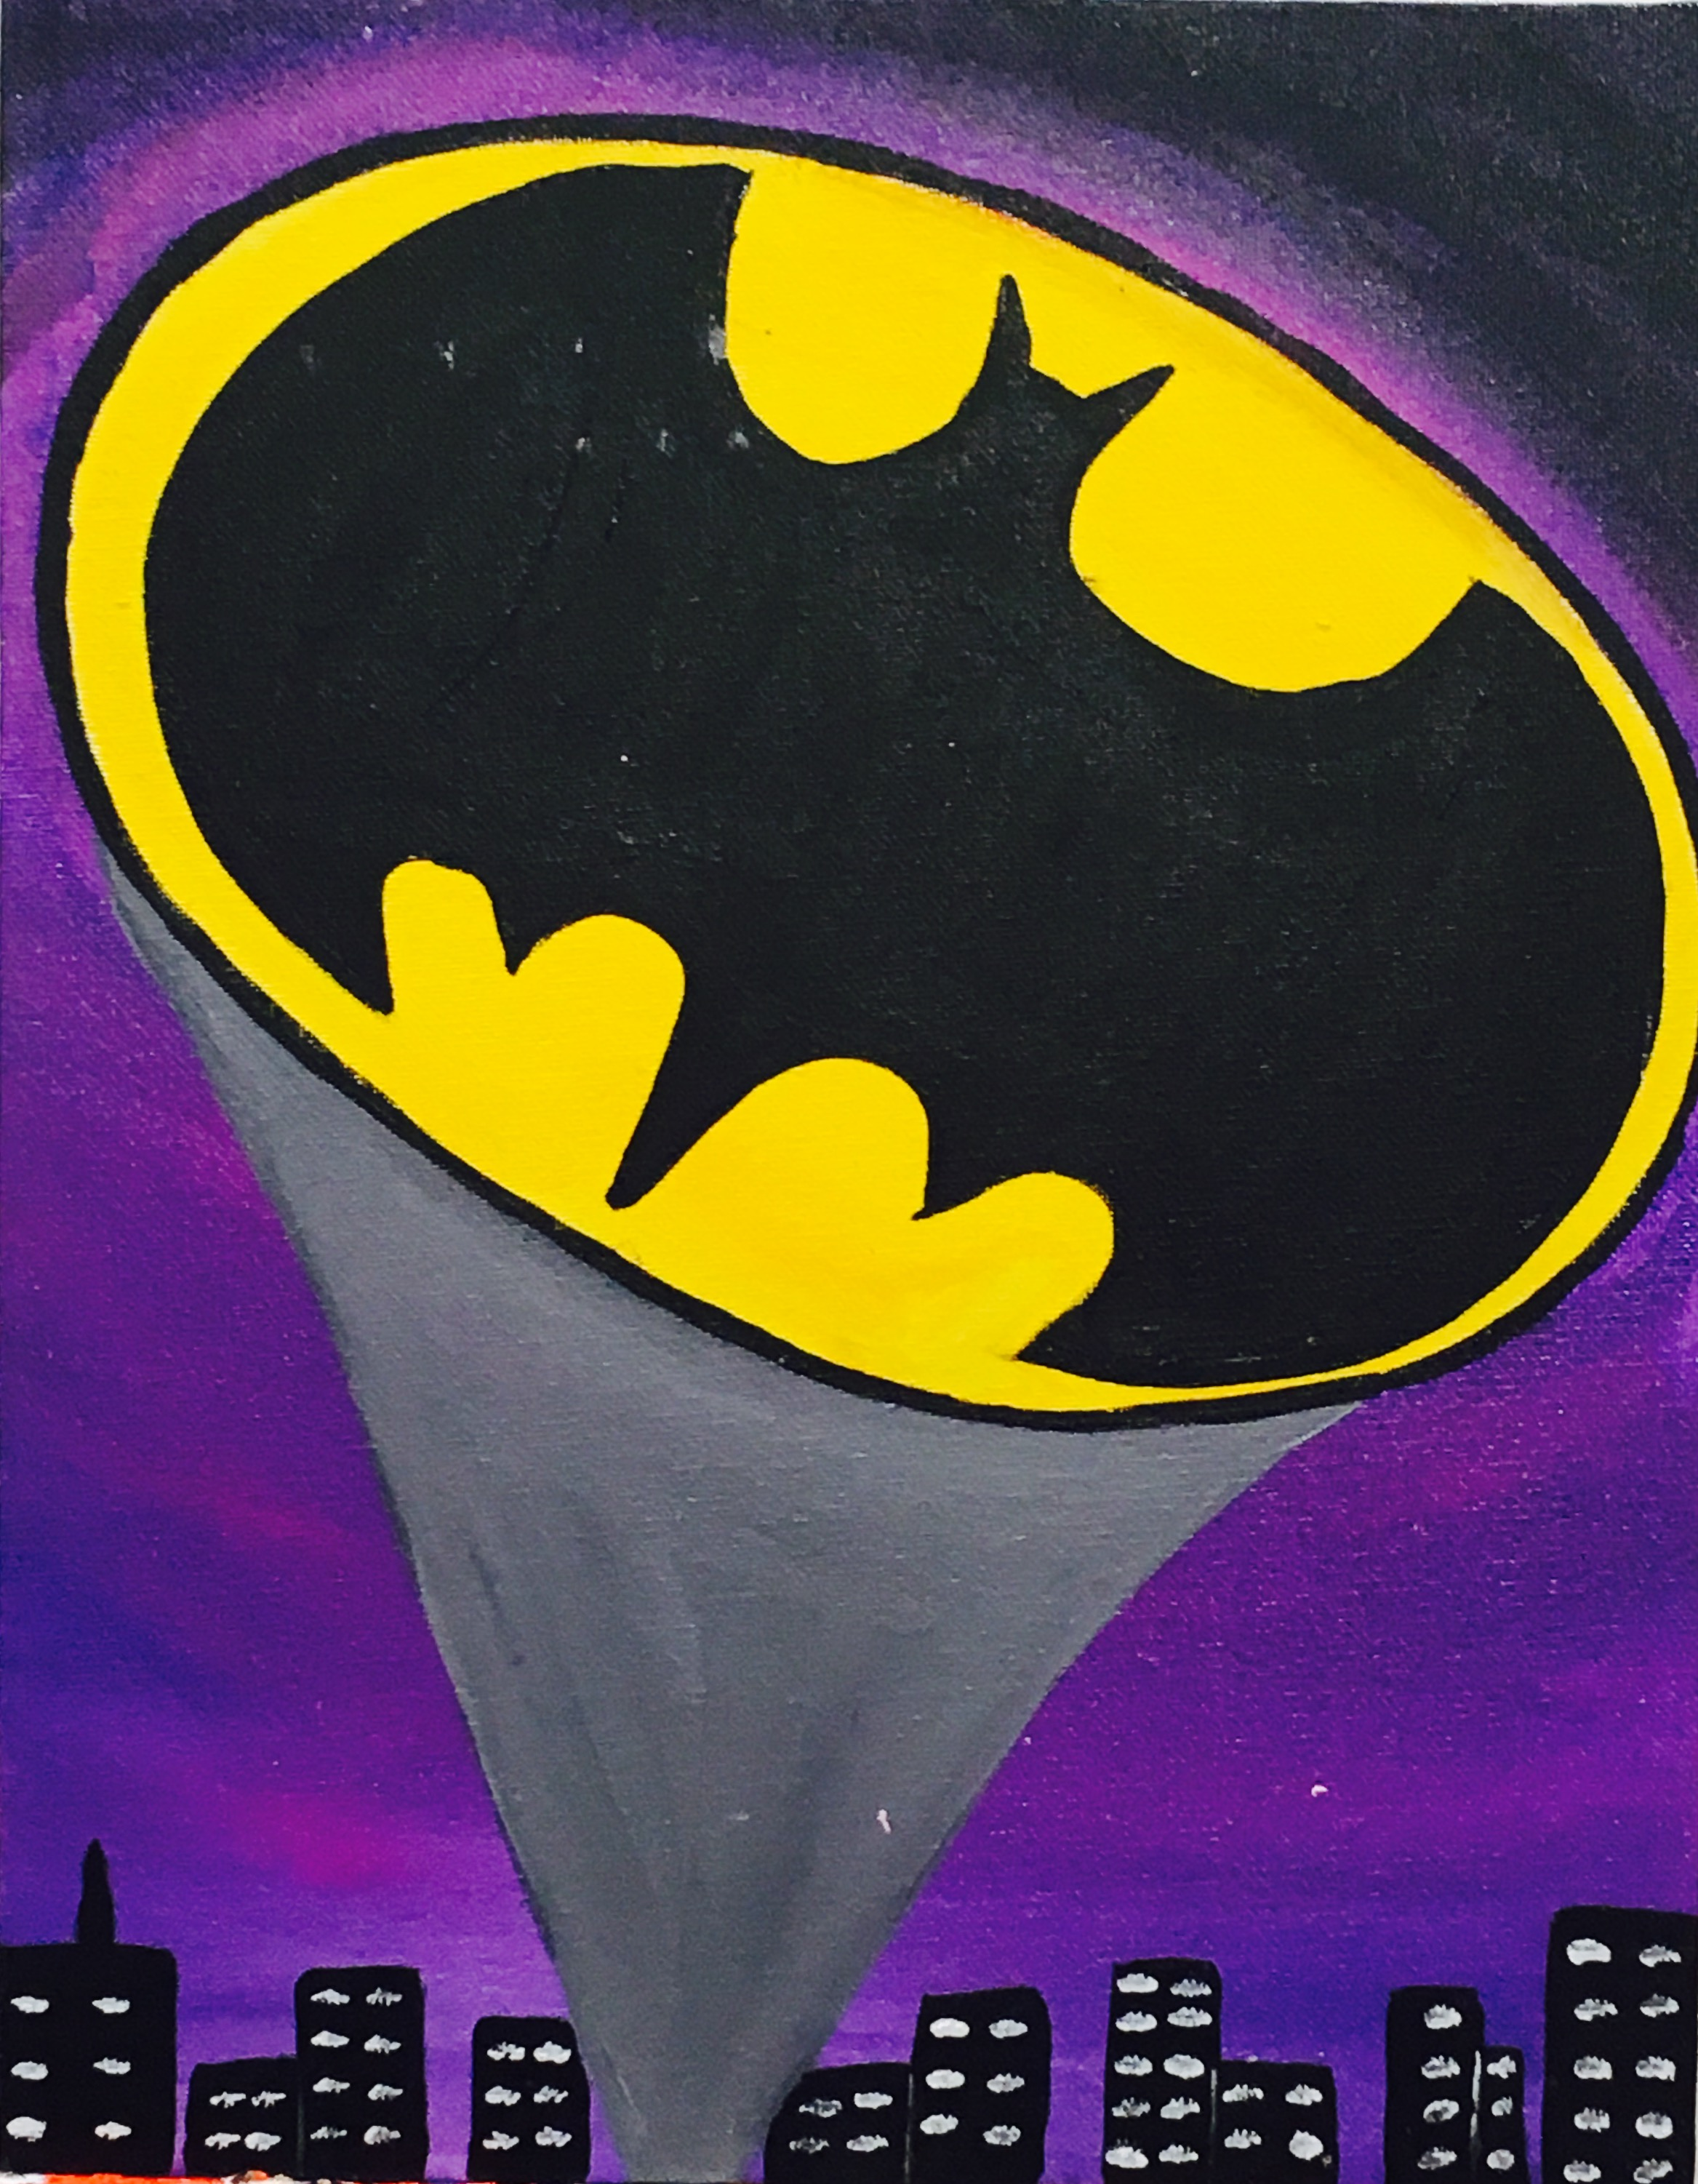 Calling Batman